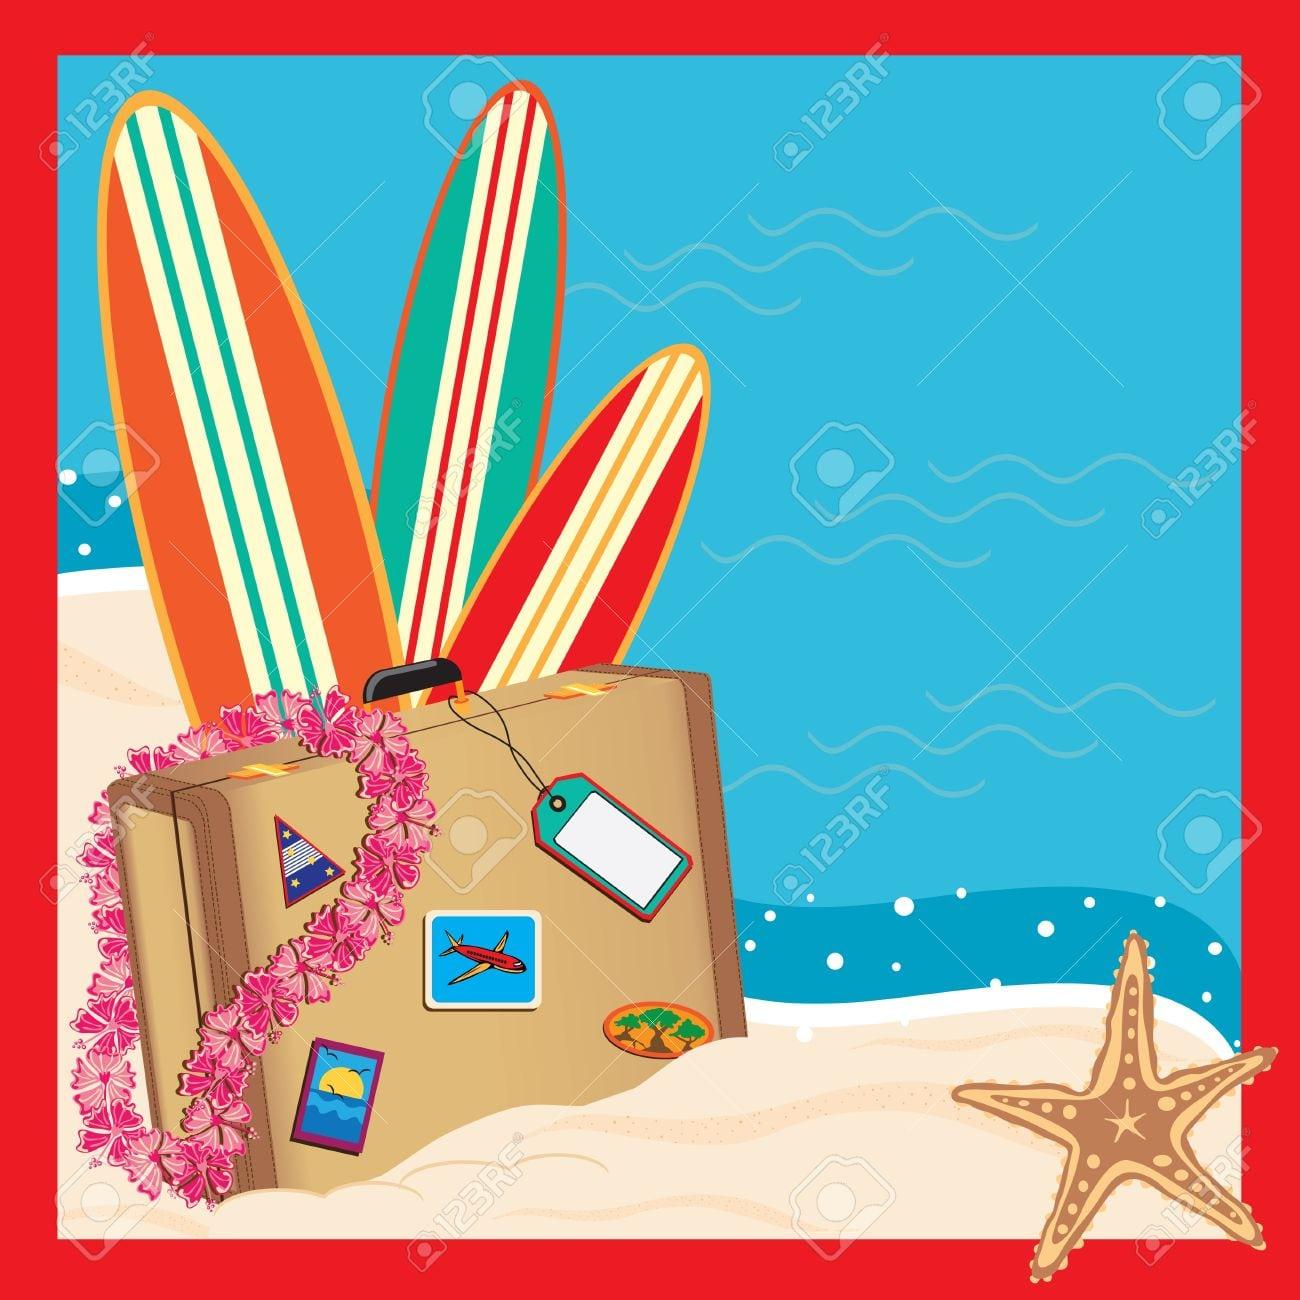 Tropical Vacation Invitation Royalty Free Cliparts, Vectors, And